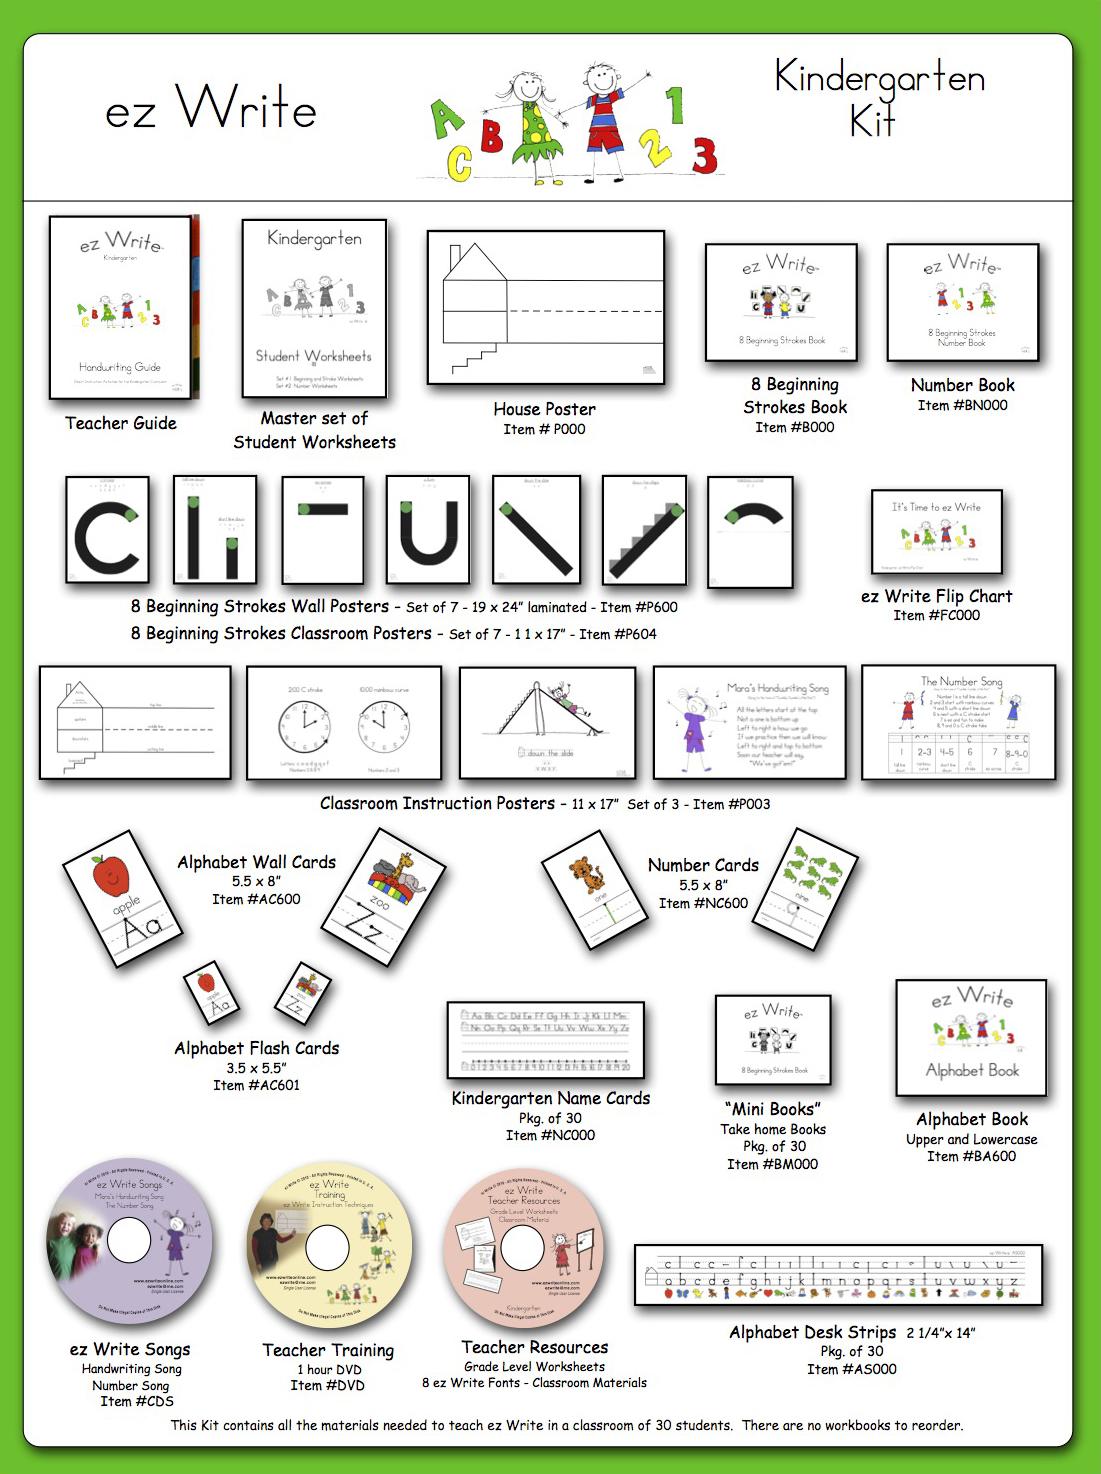 kindergarten-kit